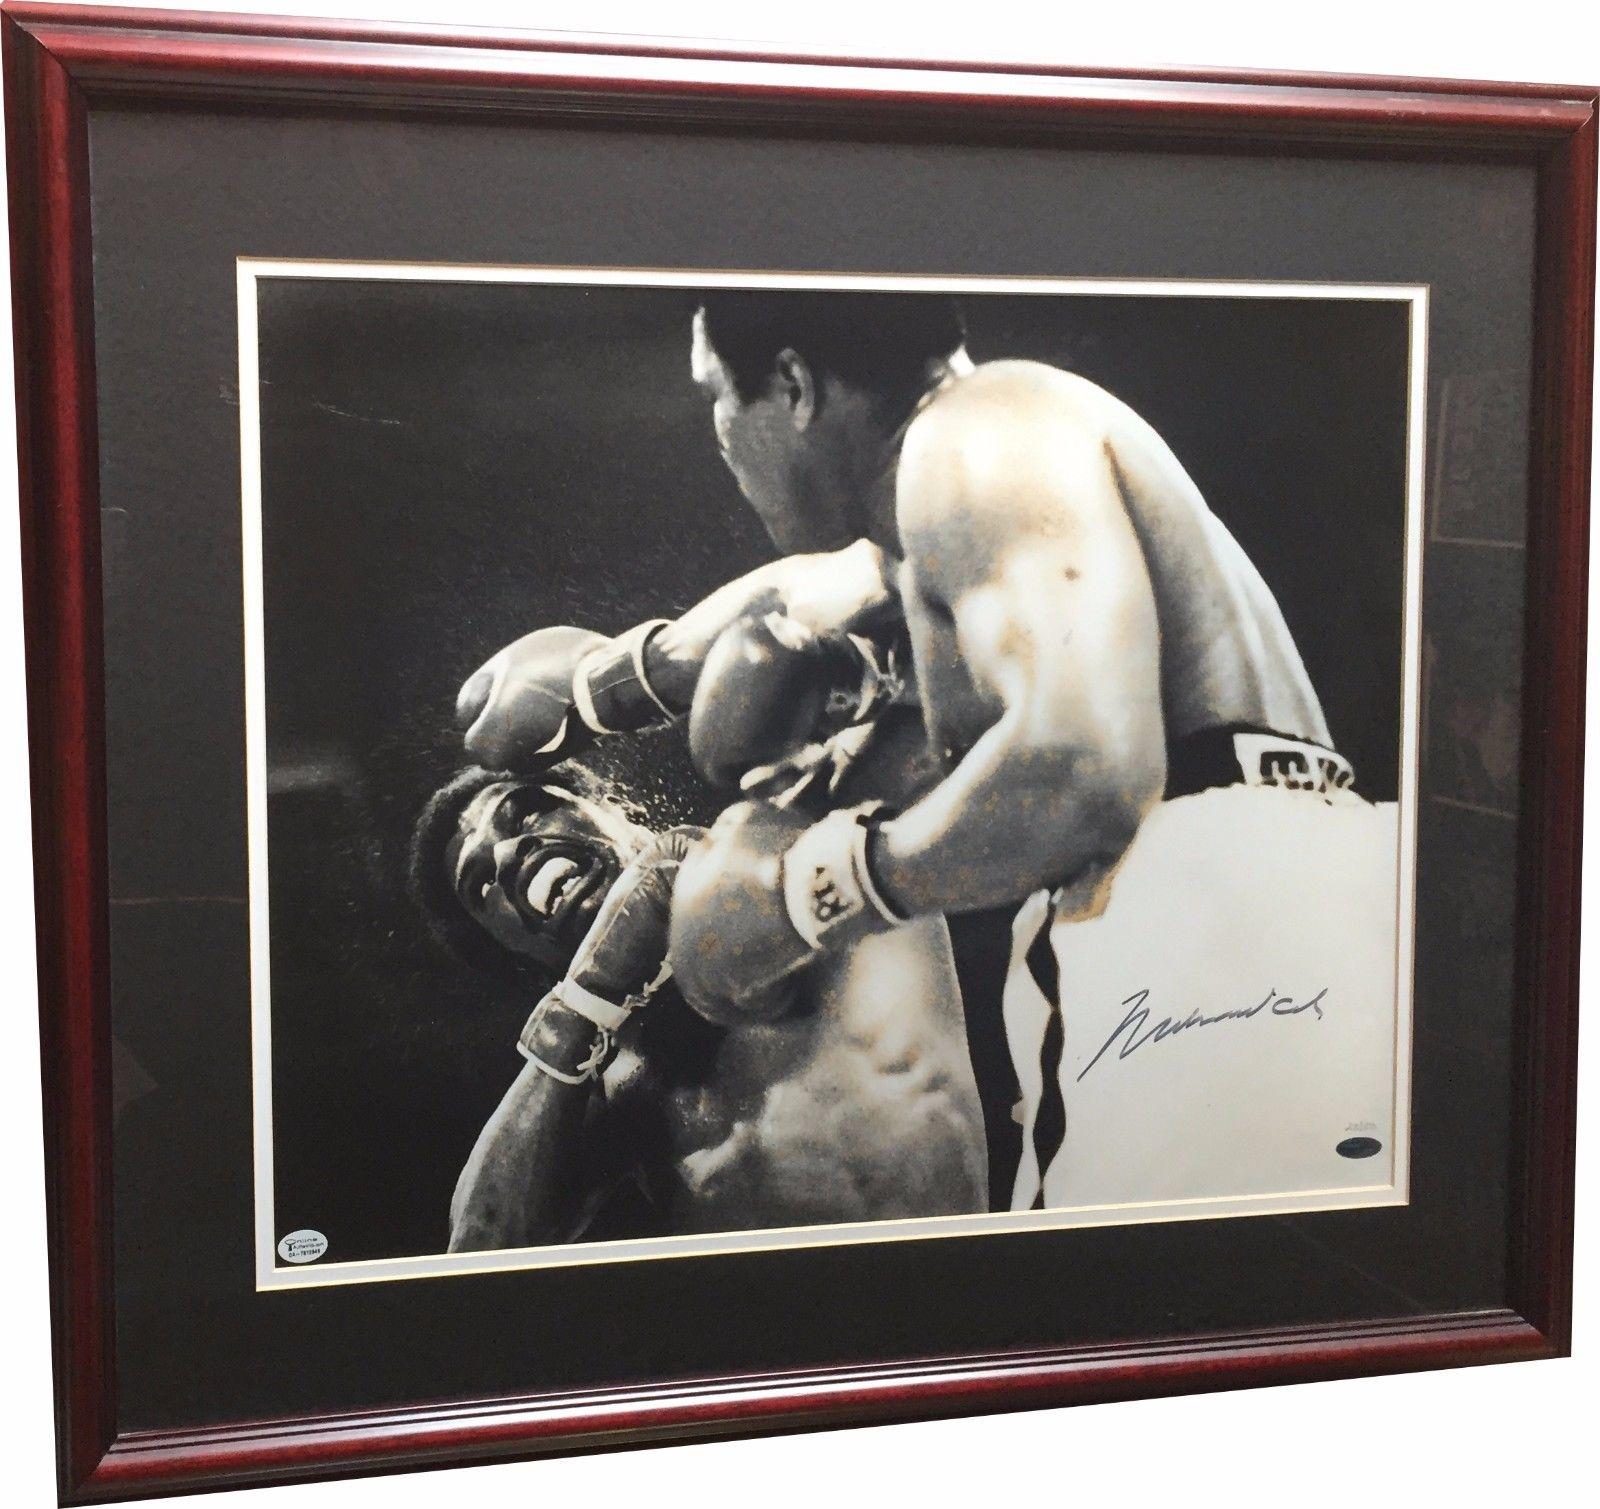 Muhammad Ali Signed 16×20 Framed Photo Vs. Spinks LE /50 Steiner COA Auto